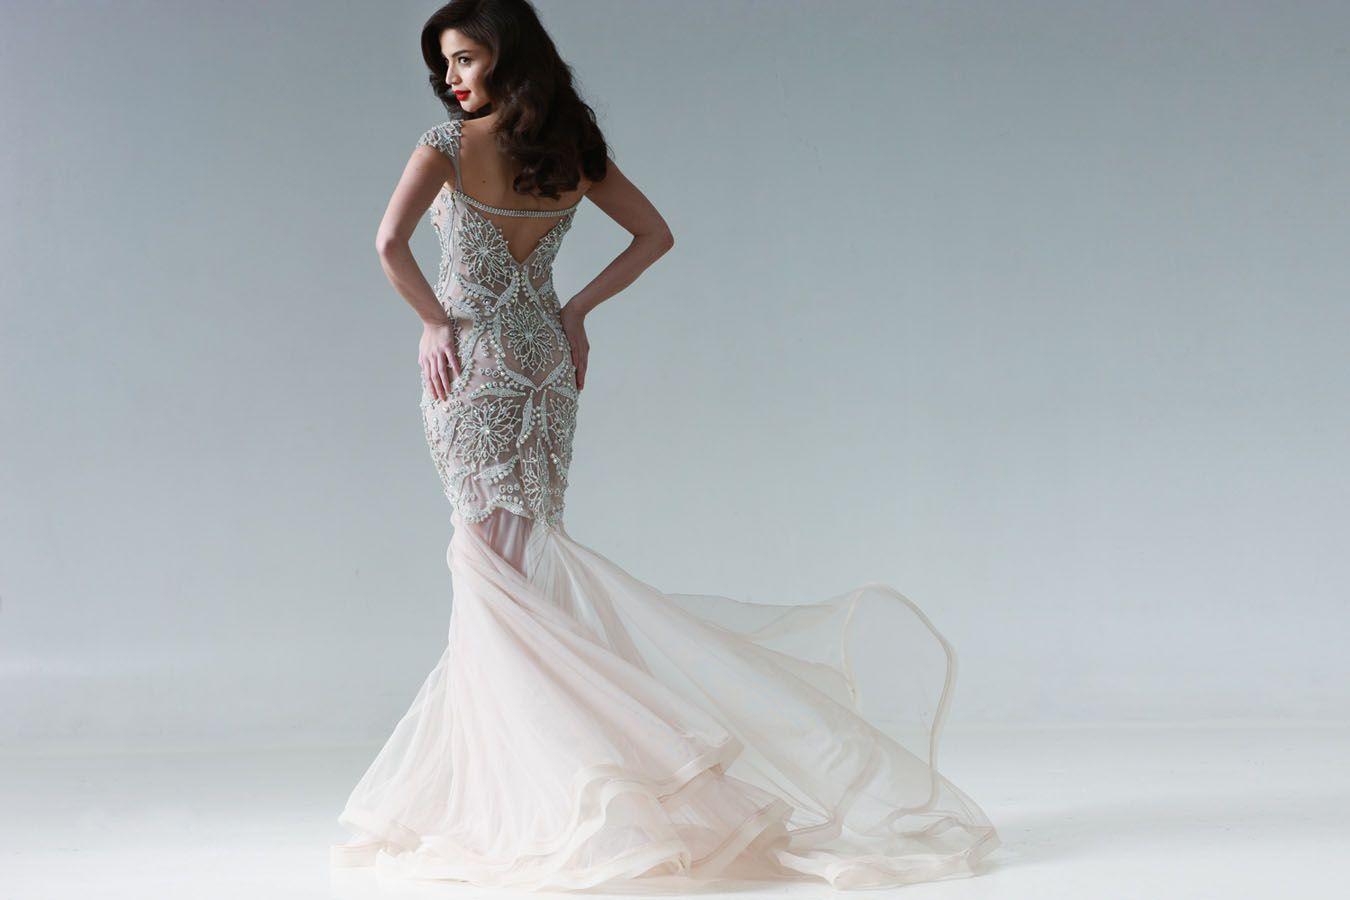 WOW! Francis Libiran is my new favorite designer! | Fashion ...